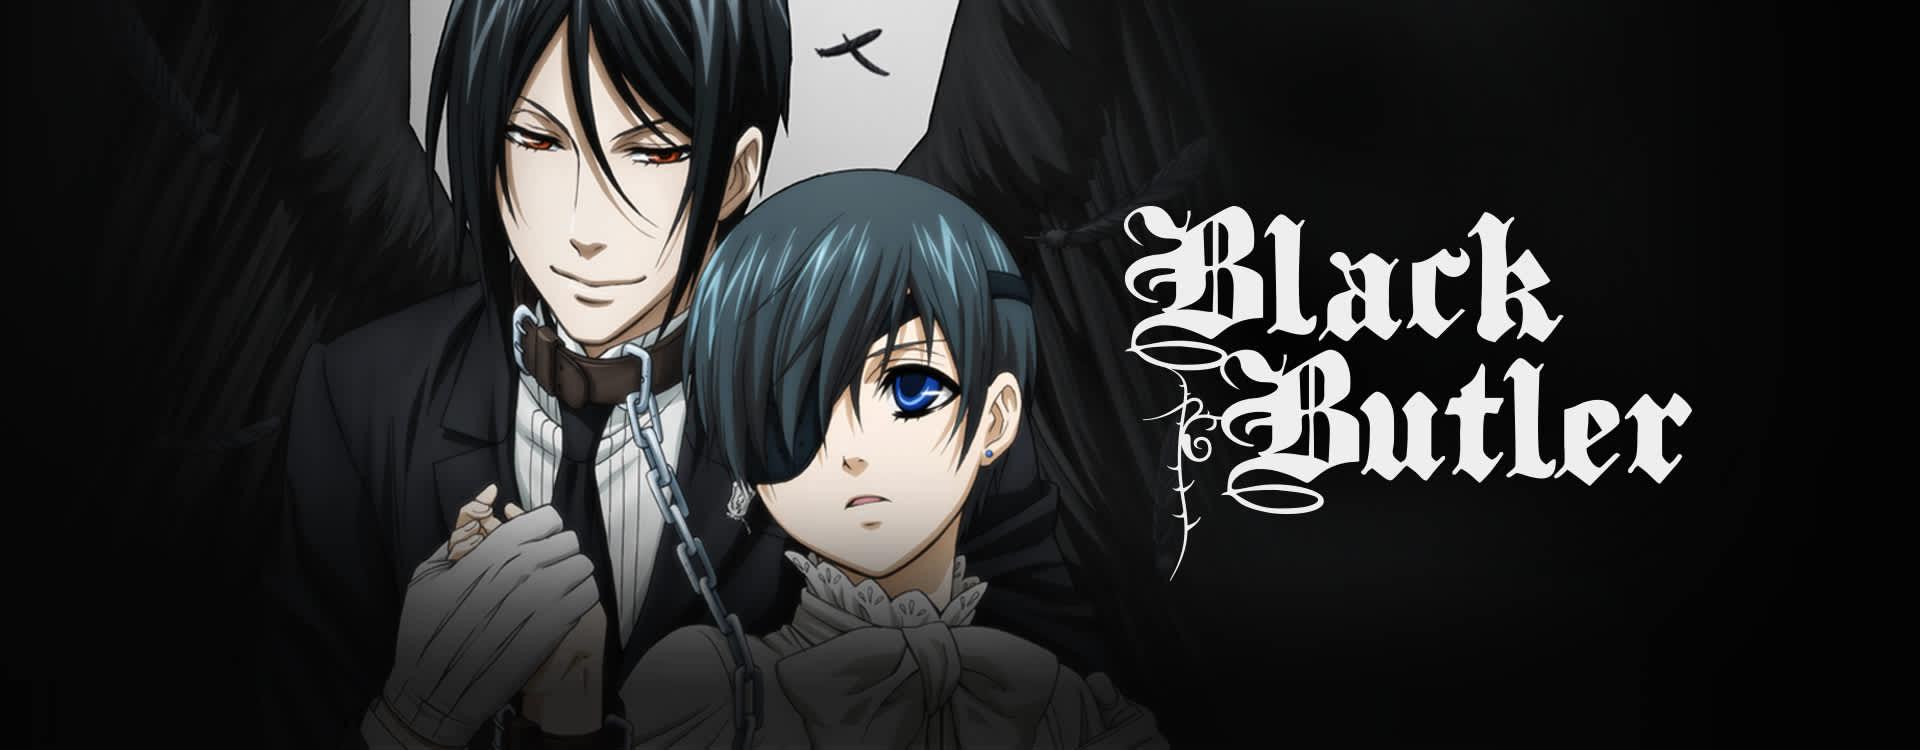 download black butler season 2 sub indo mkv raphaelo go raphaelo go overblog